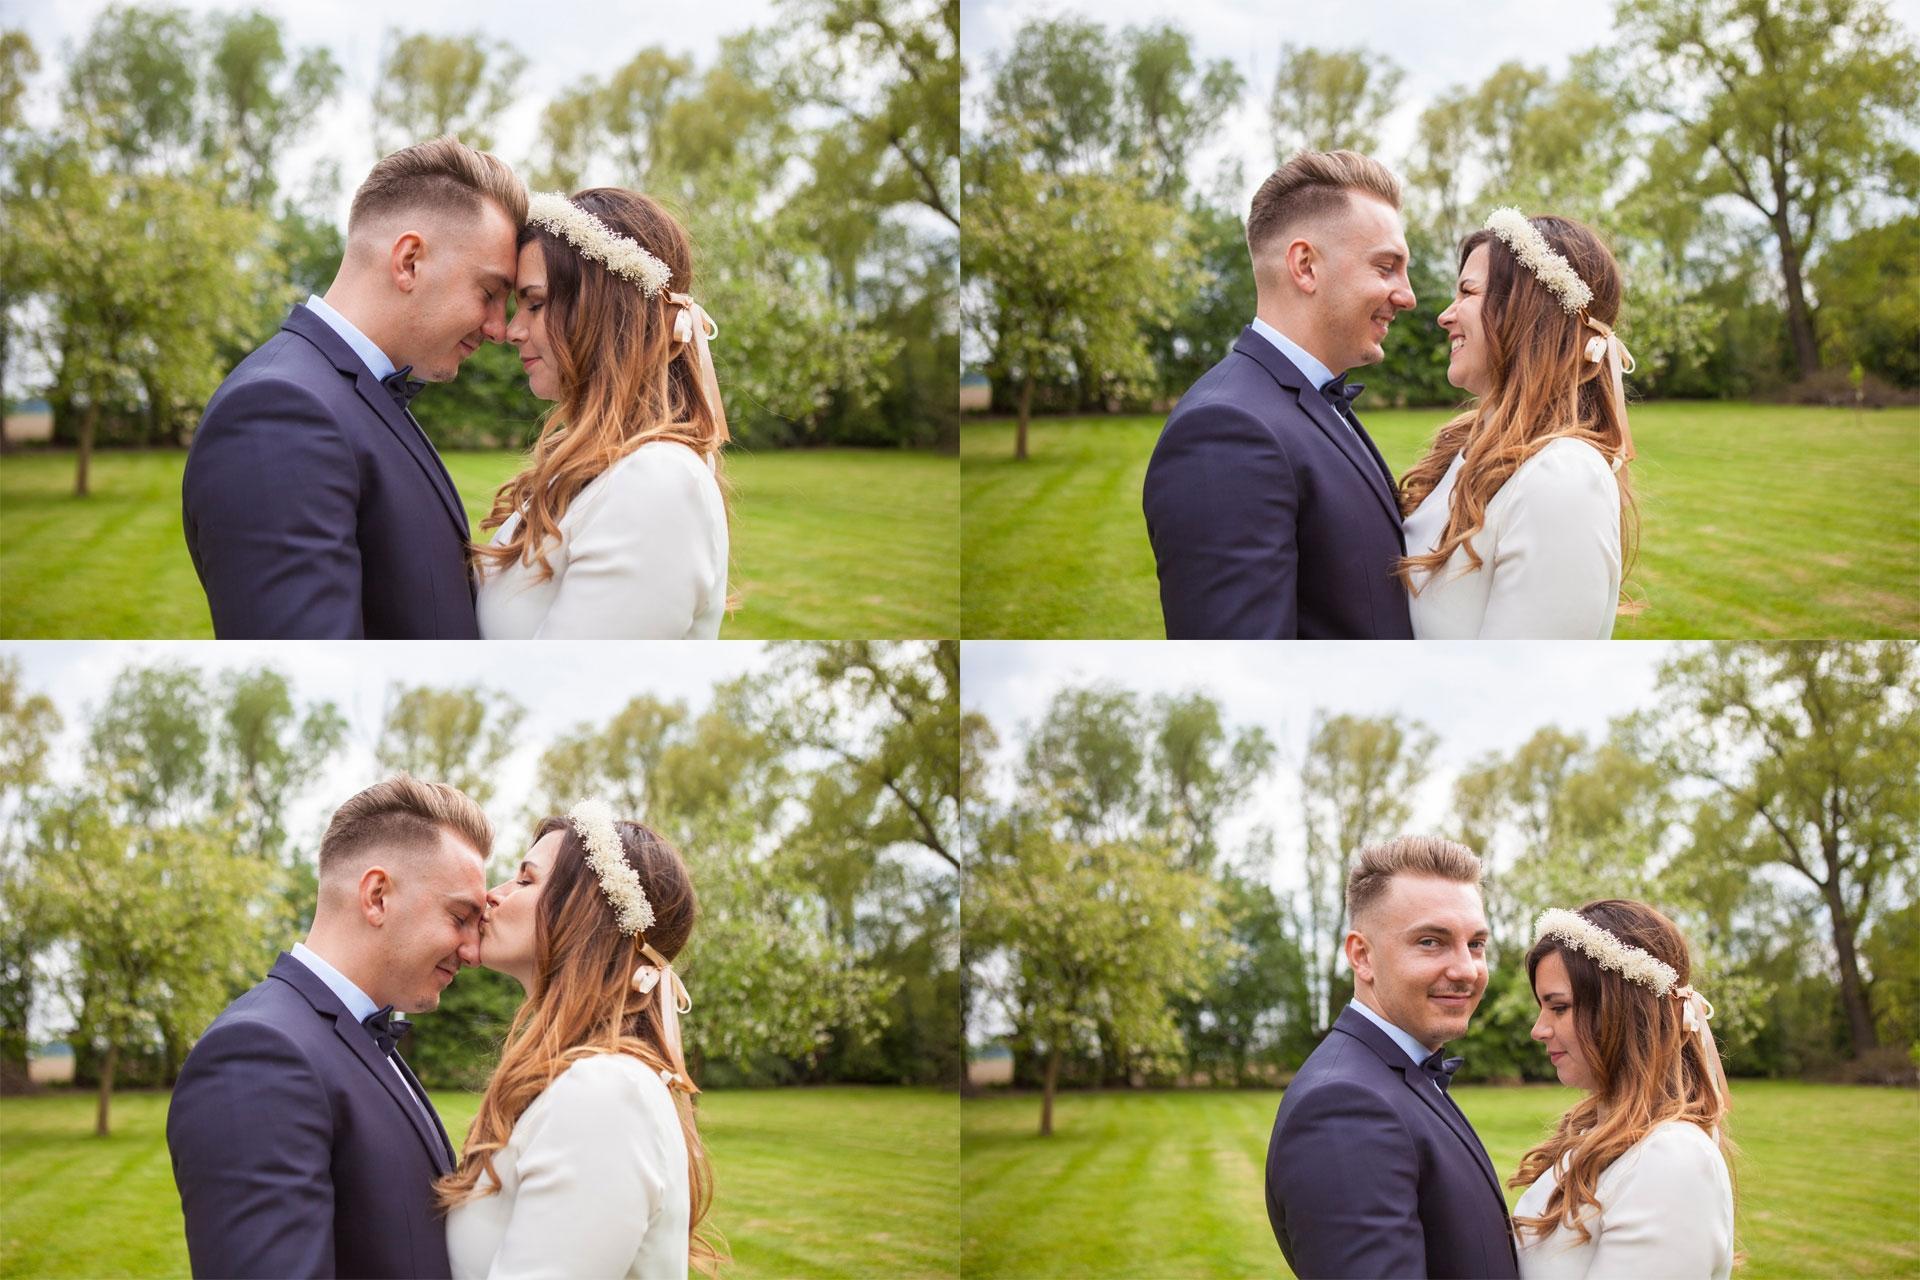 particuliers-evenements-mariages-oui-zelie&valentin-19